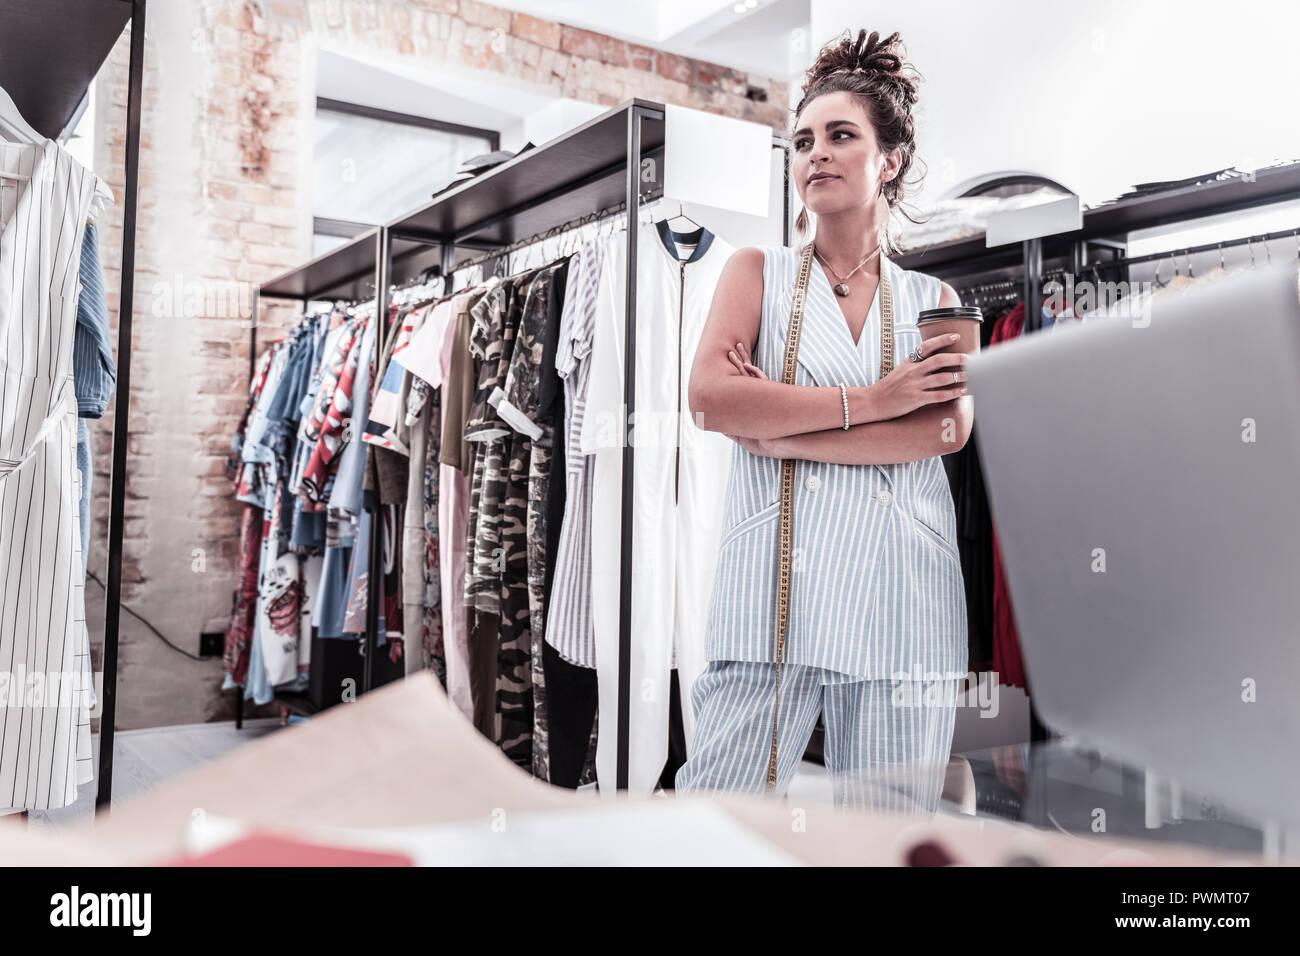 Hard-working creative fashion designer having little coffee break working hard - Stock Image